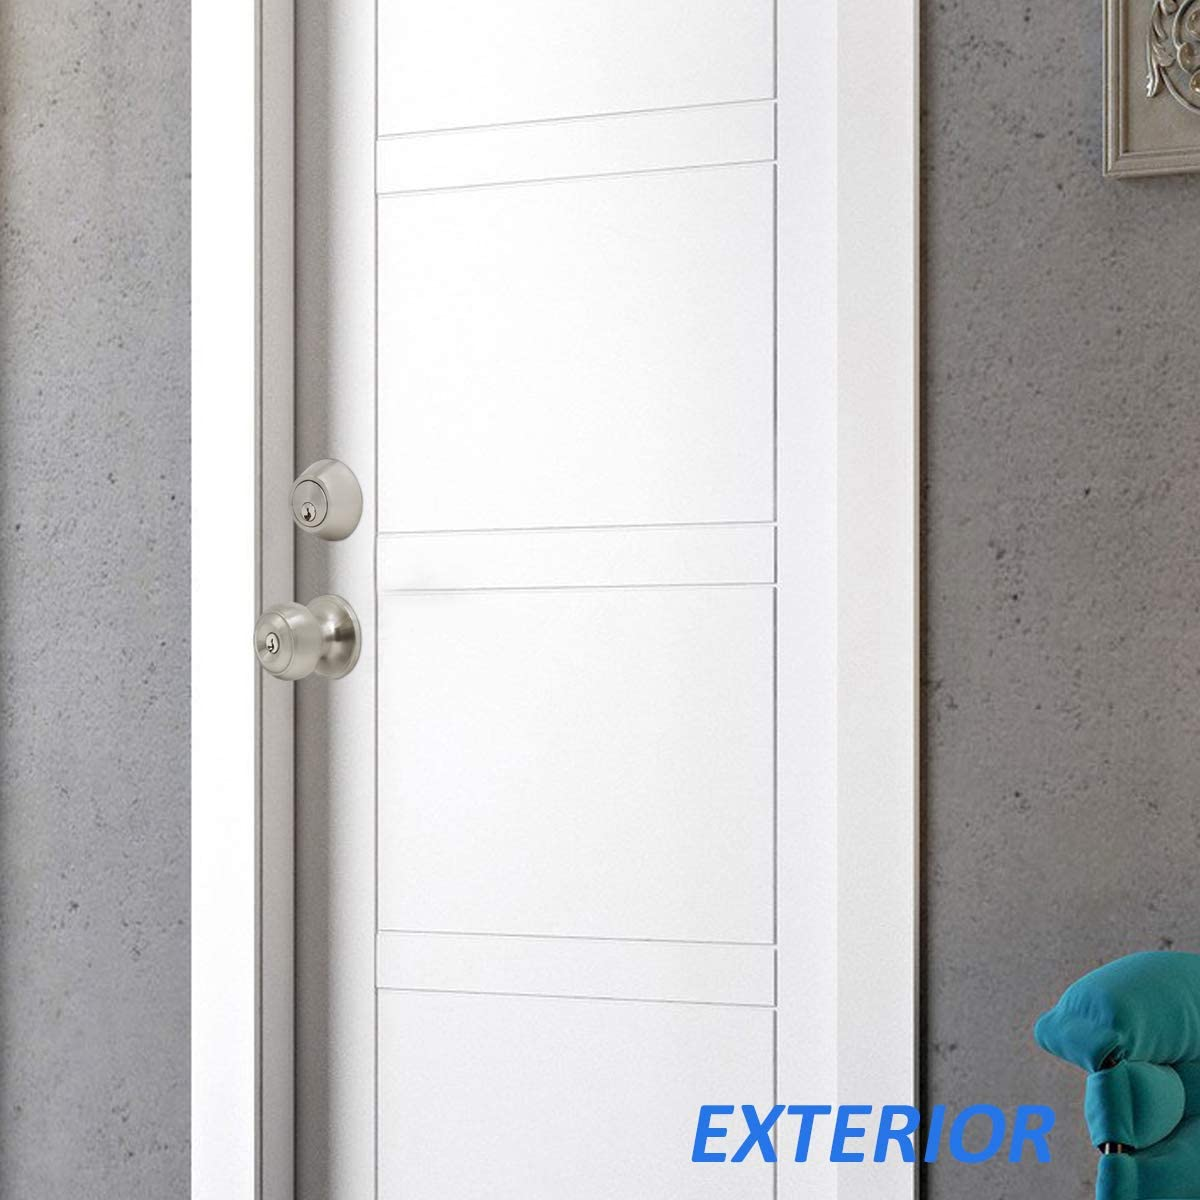 6 Pack Entry//Entrance Door Handleset with Deadbolt Entry Door Knob Lockset and Single Cylinder Deadbolt Combination Set Satin Nickel Keyed Alike Keyed on One Side